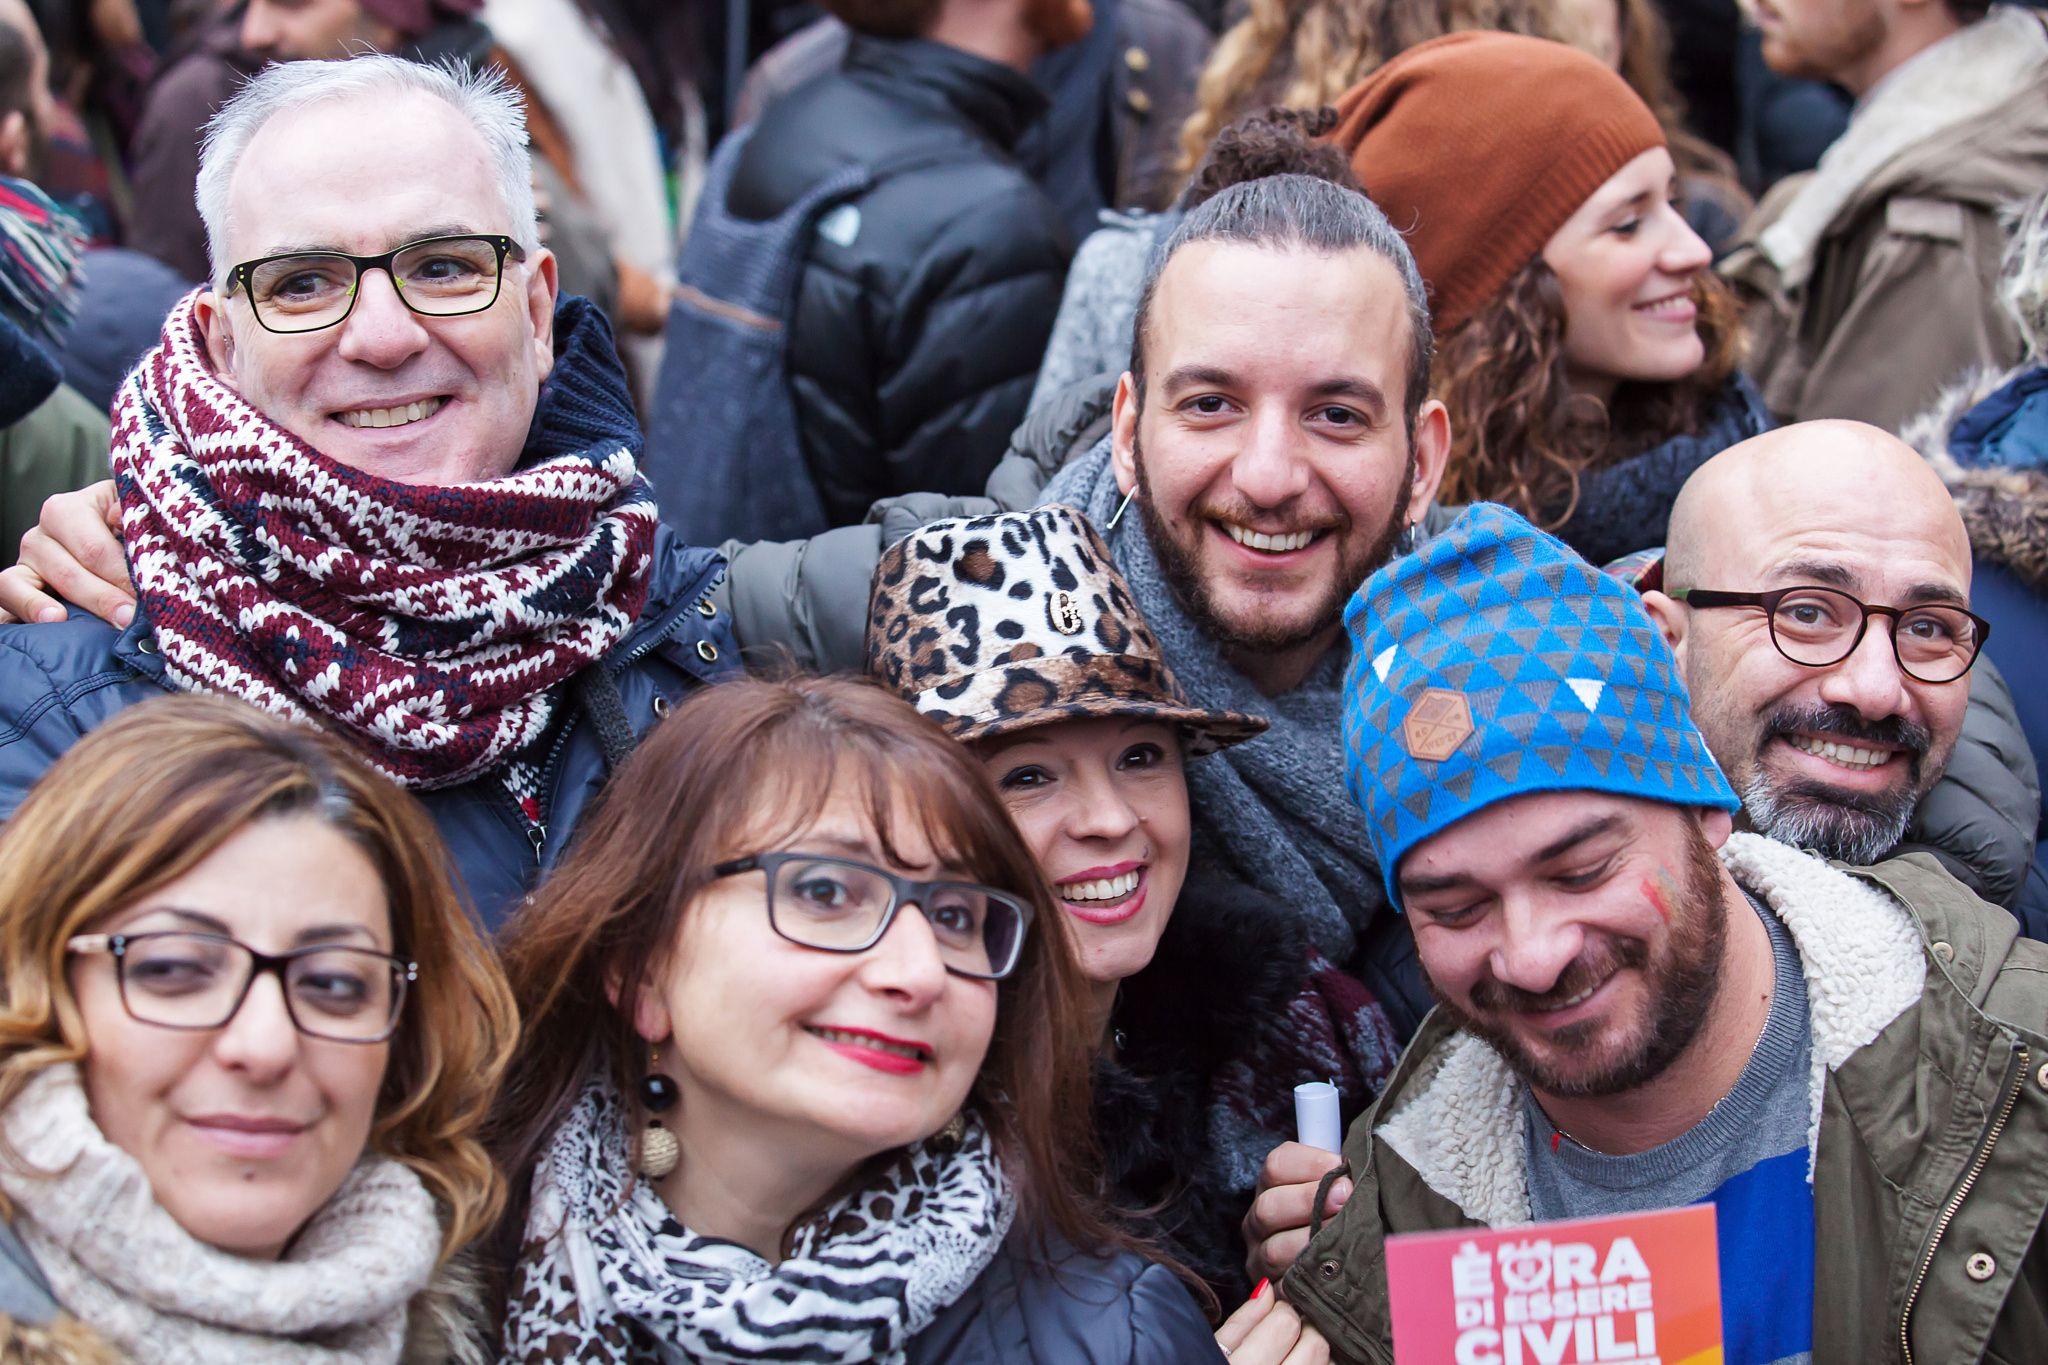 Svegliatitalia - Rome, Italy - 23 January 2016: Svegliatitalia, demonstration in Piazza del Pantheon in favor of the civil rights of homosexual couples.